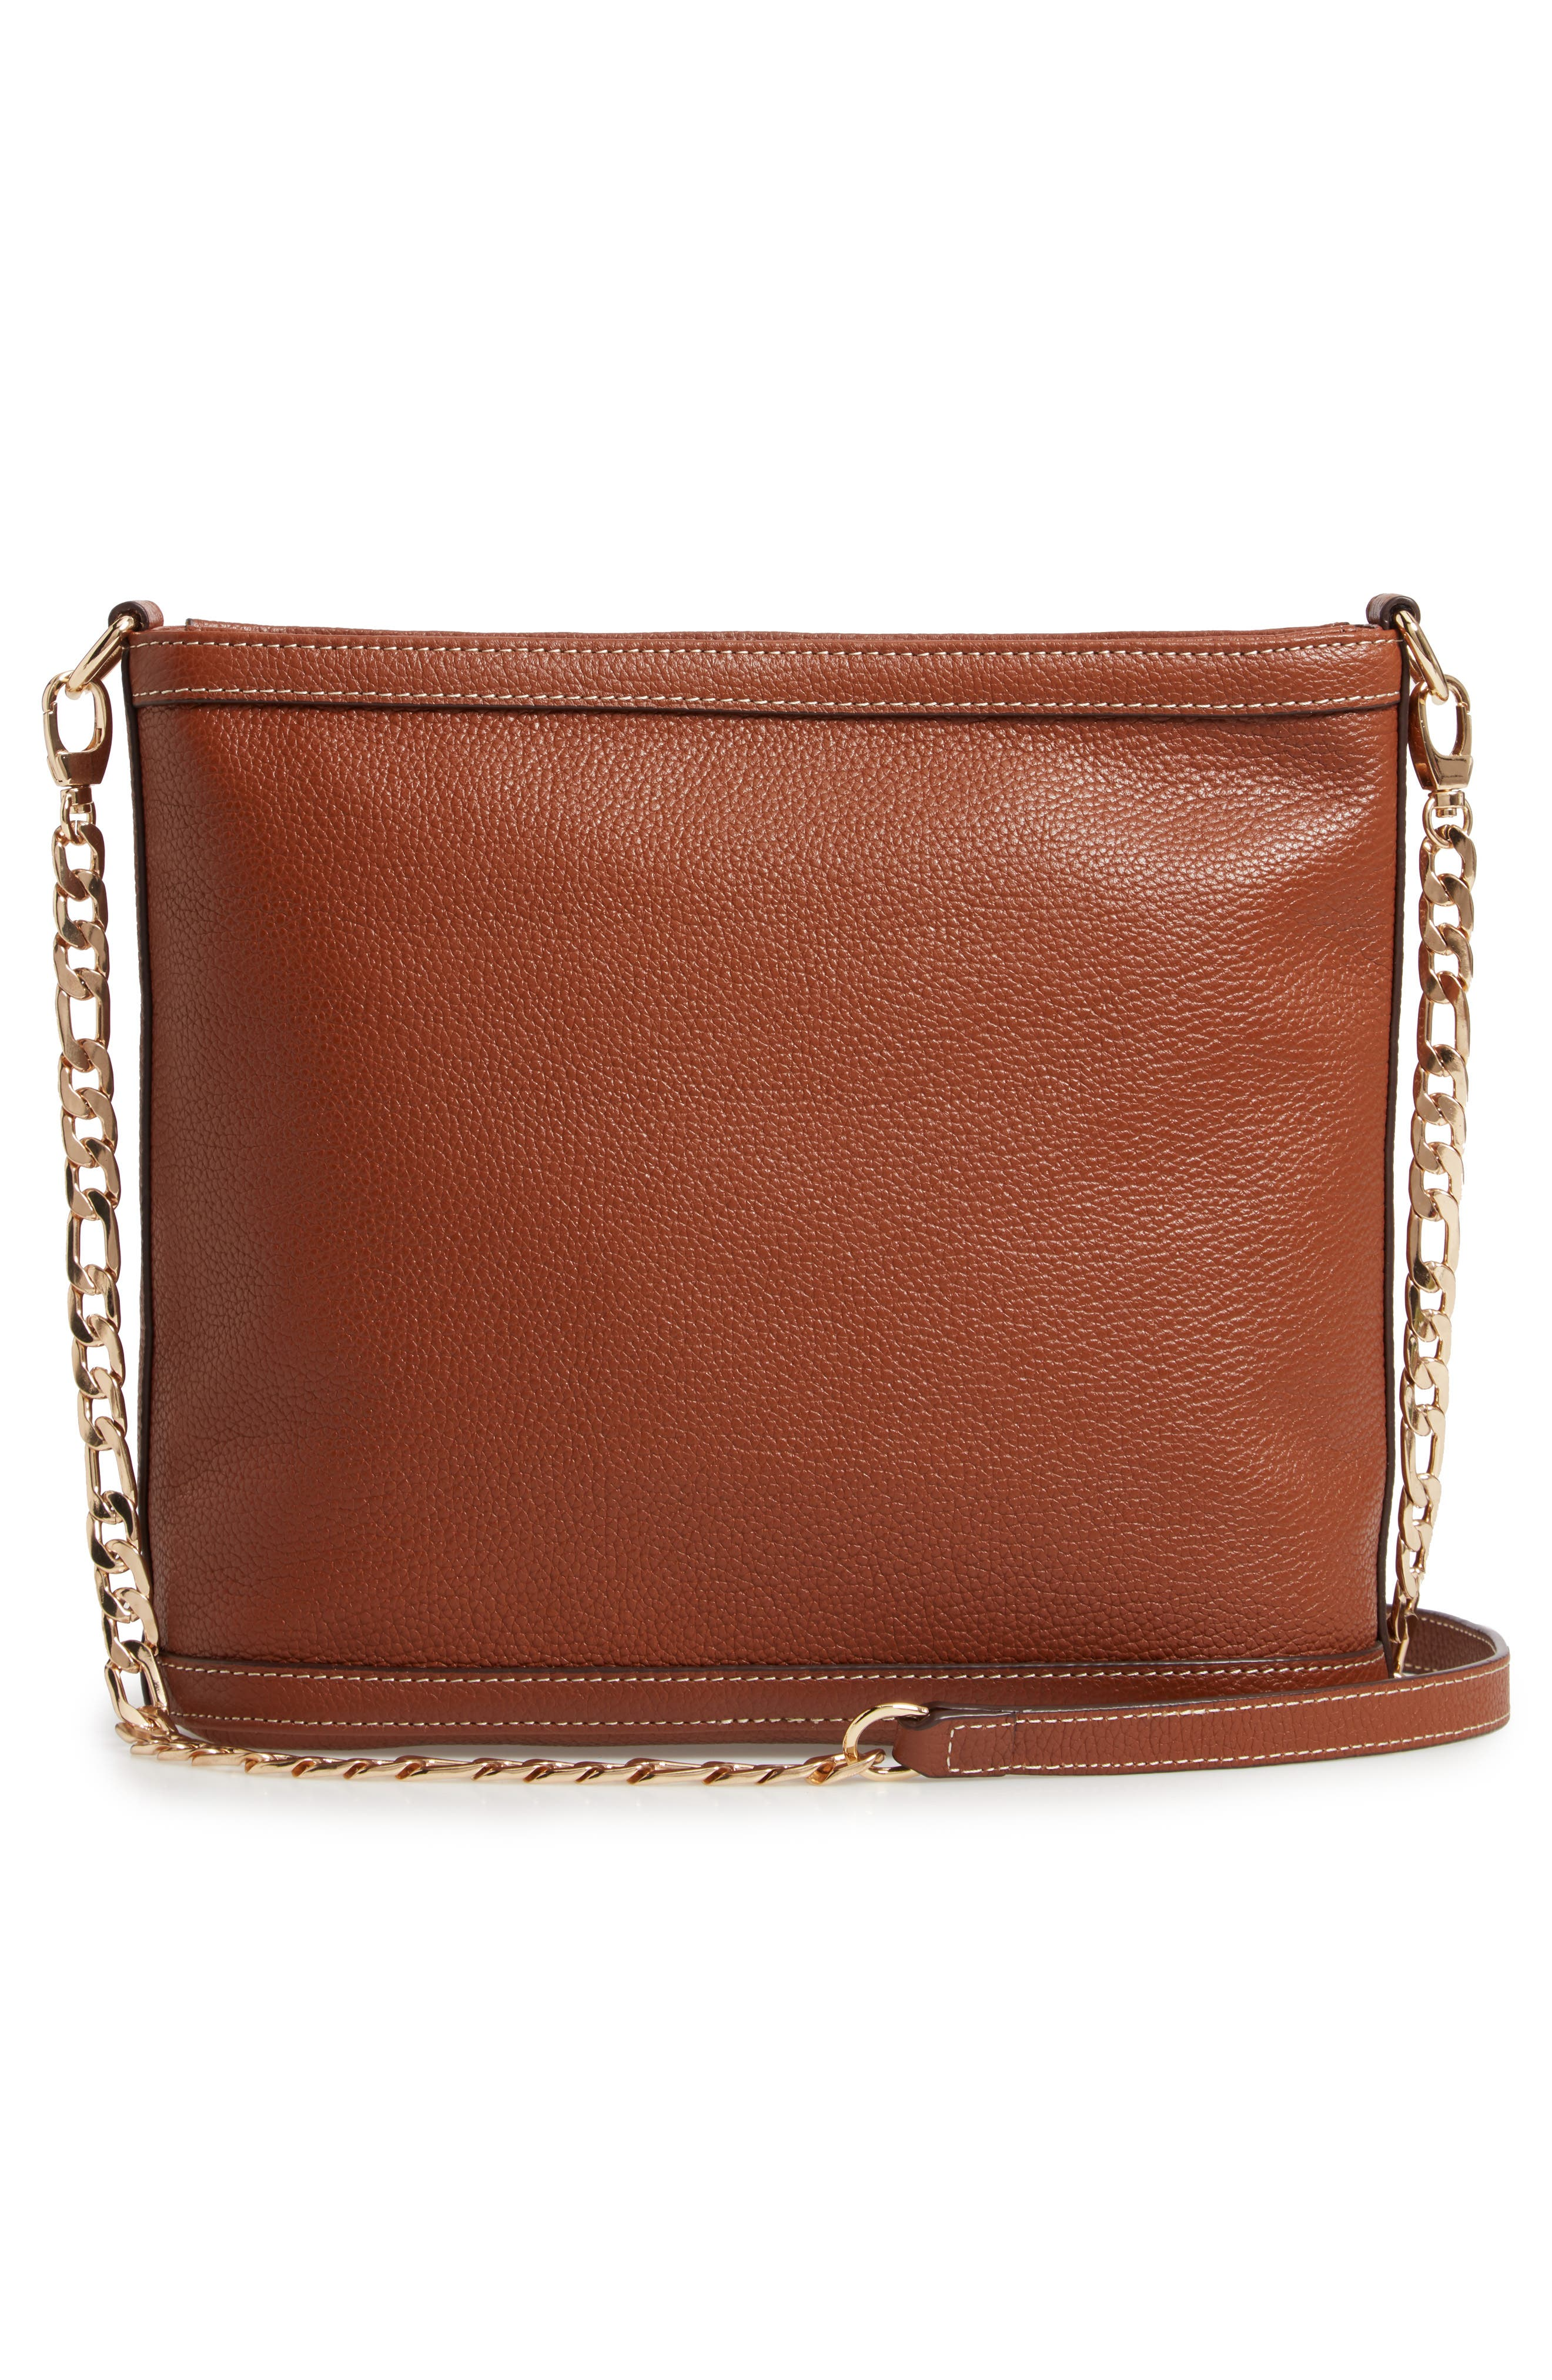 NORDSTROM,                             Maribel Leather Crossbody Bag,                             Alternate thumbnail 3, color,                             BROWN AZTEC